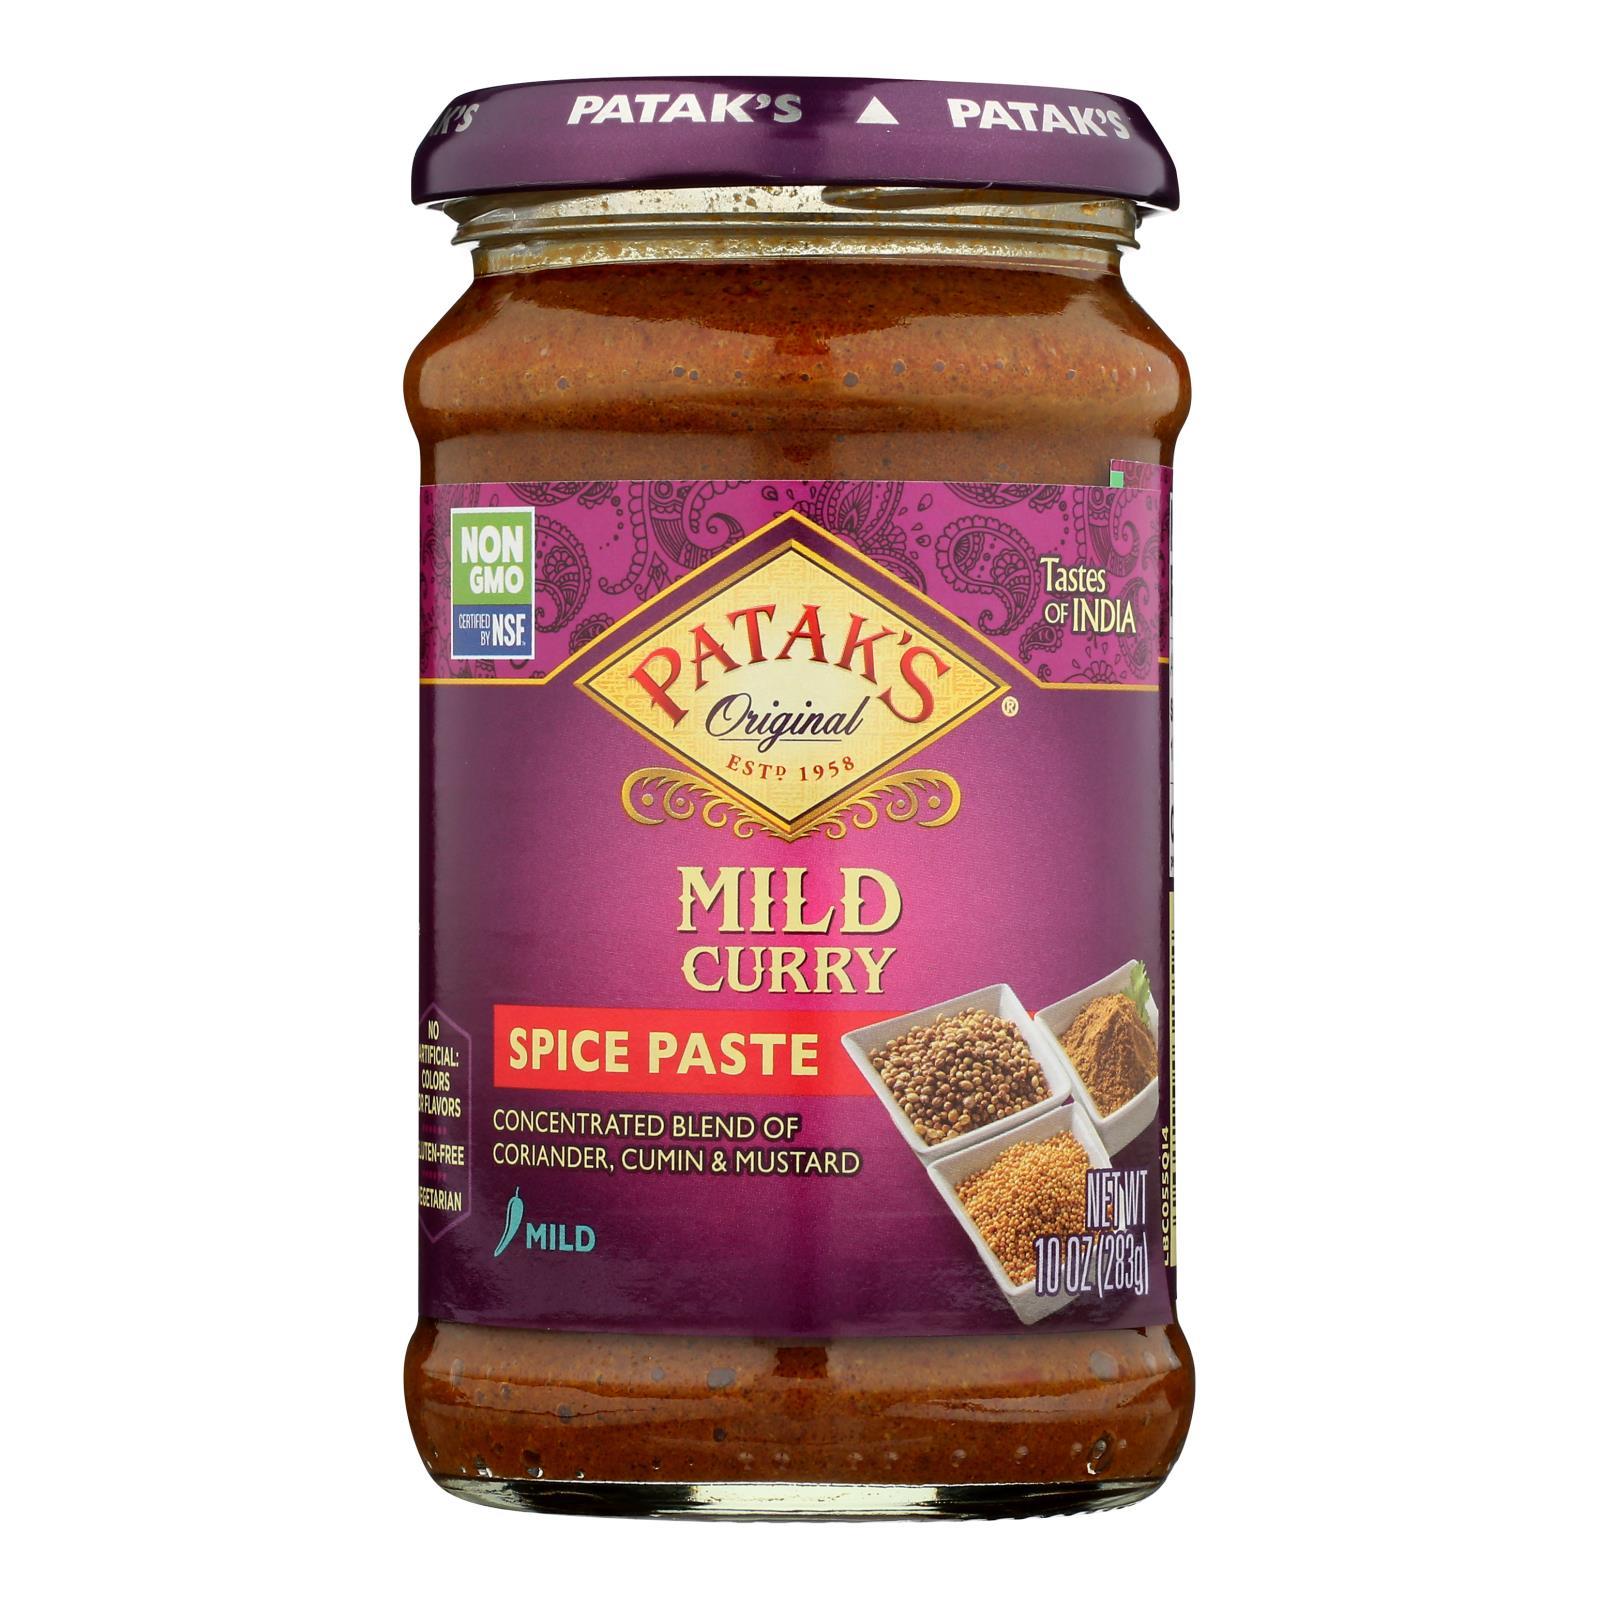 Pataks Spice Paste - Mild Curry - Mild - 10 oz - case of 6